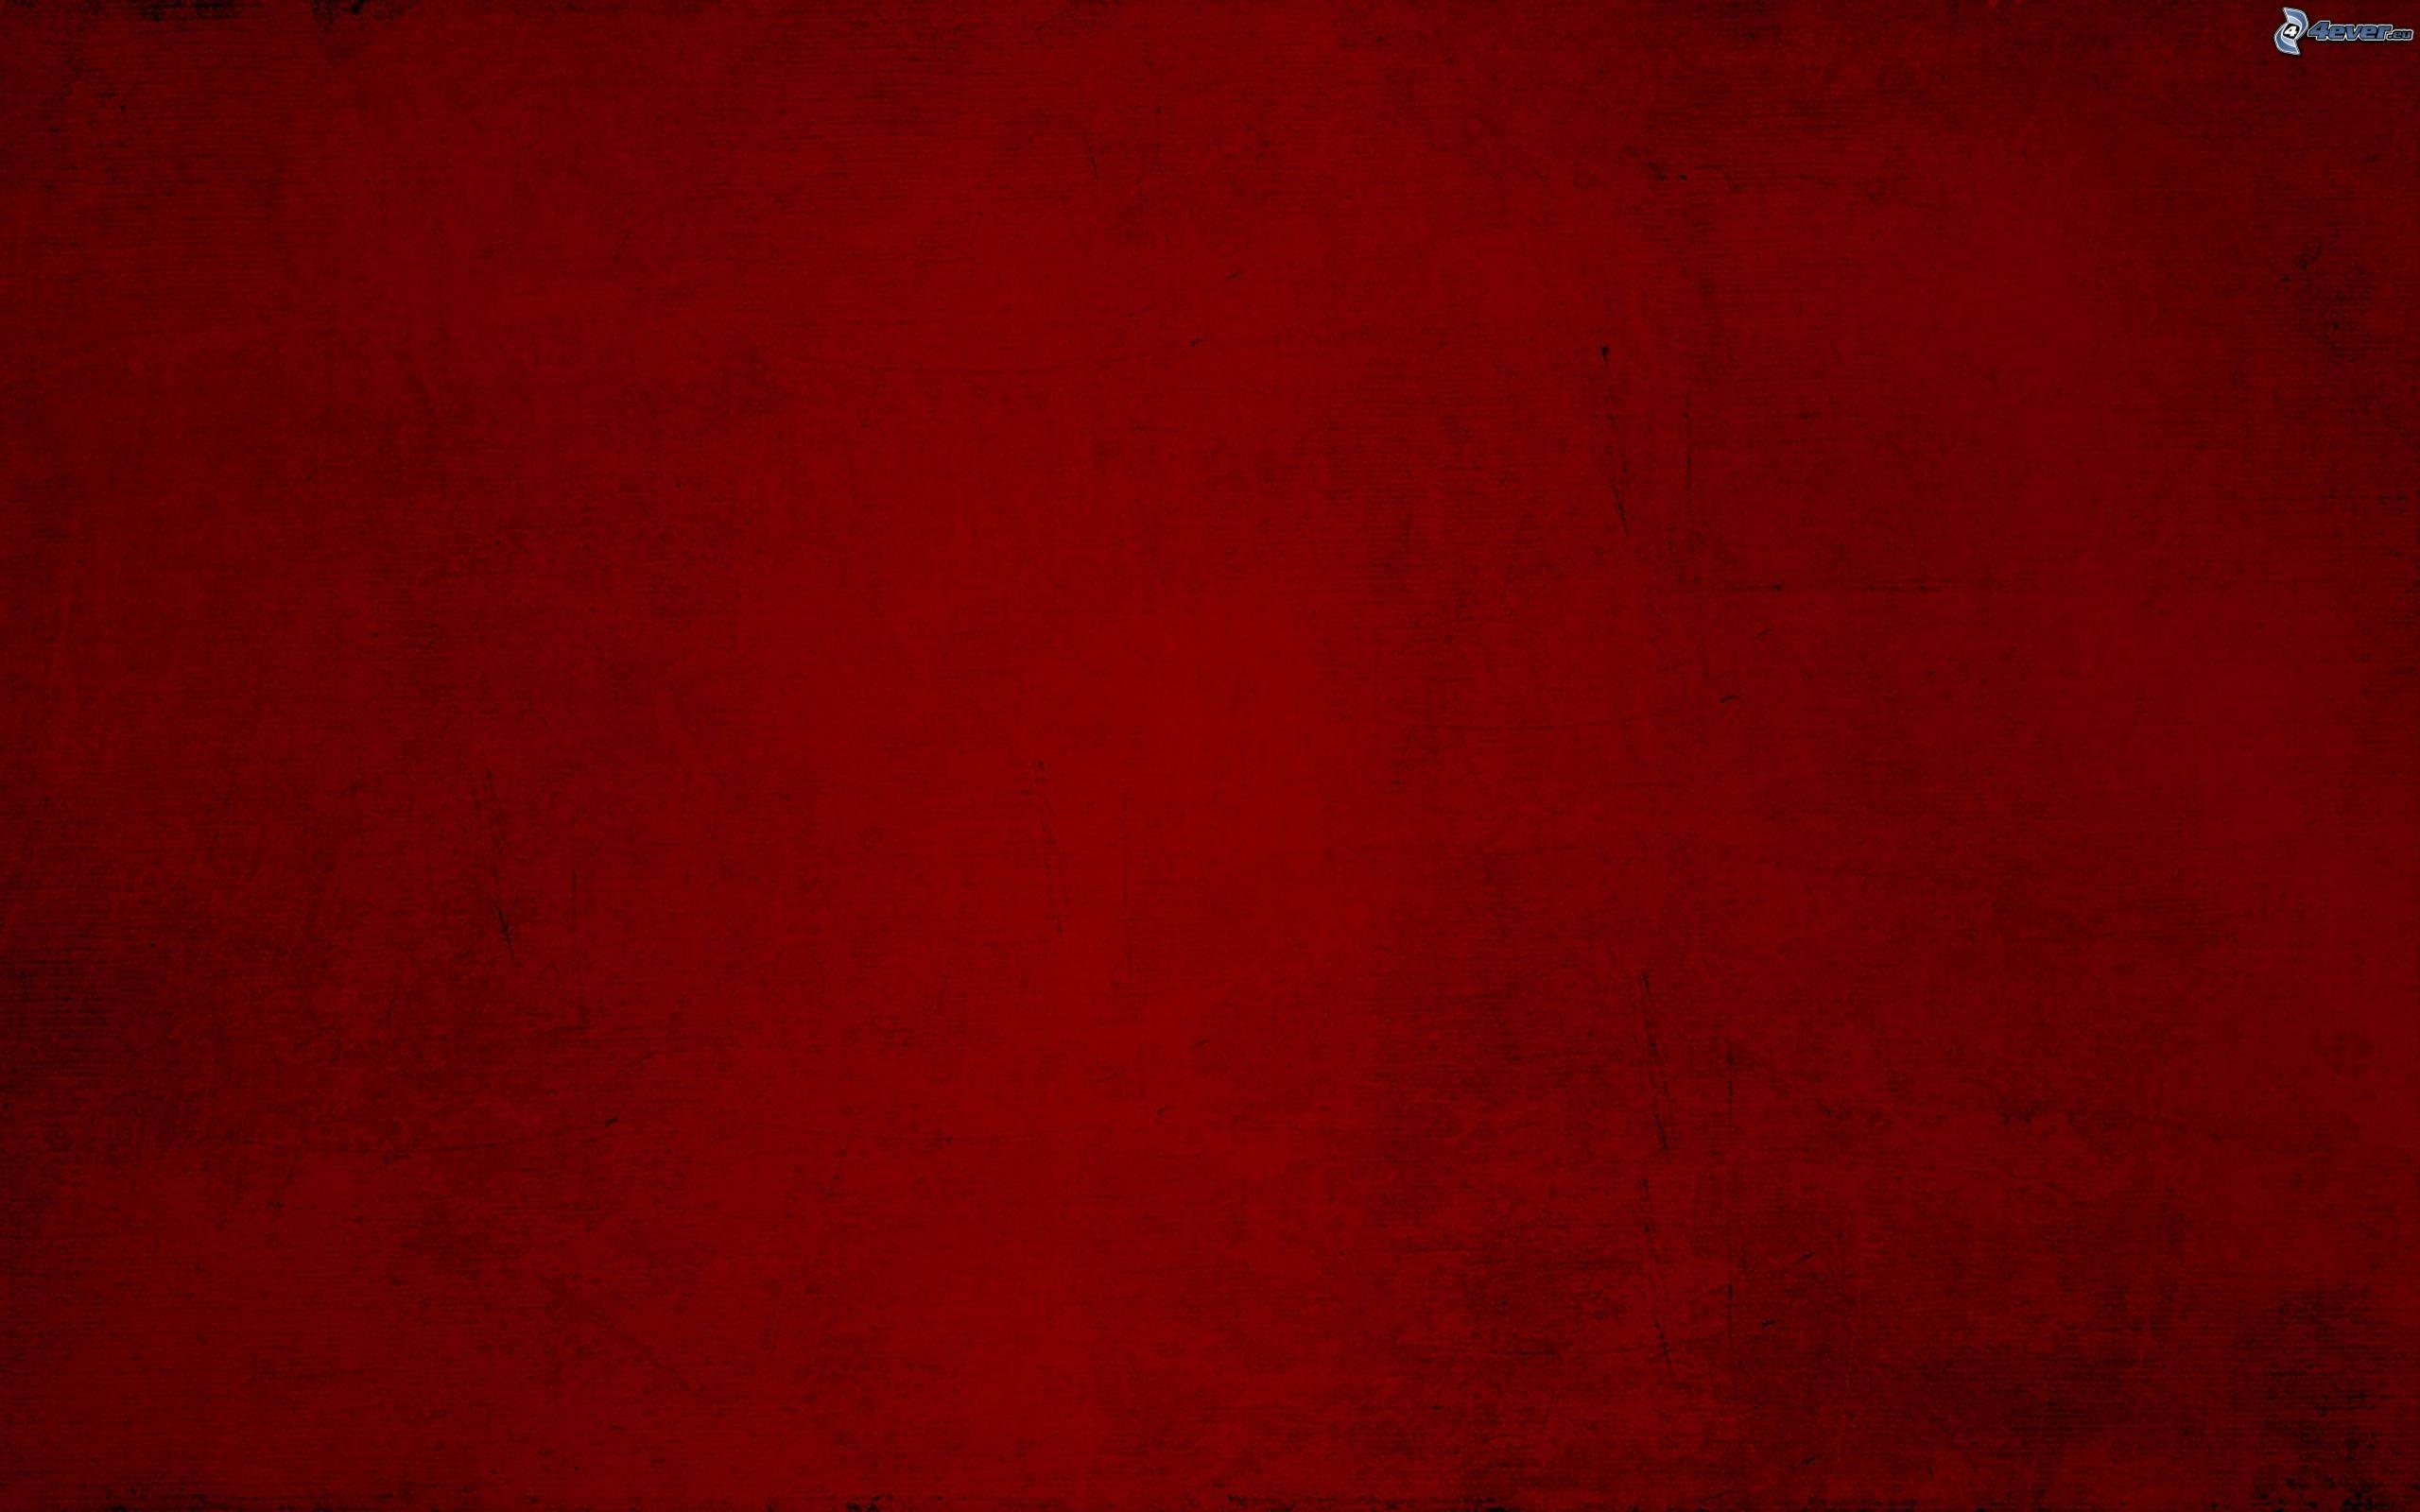 Sfondo Rosso